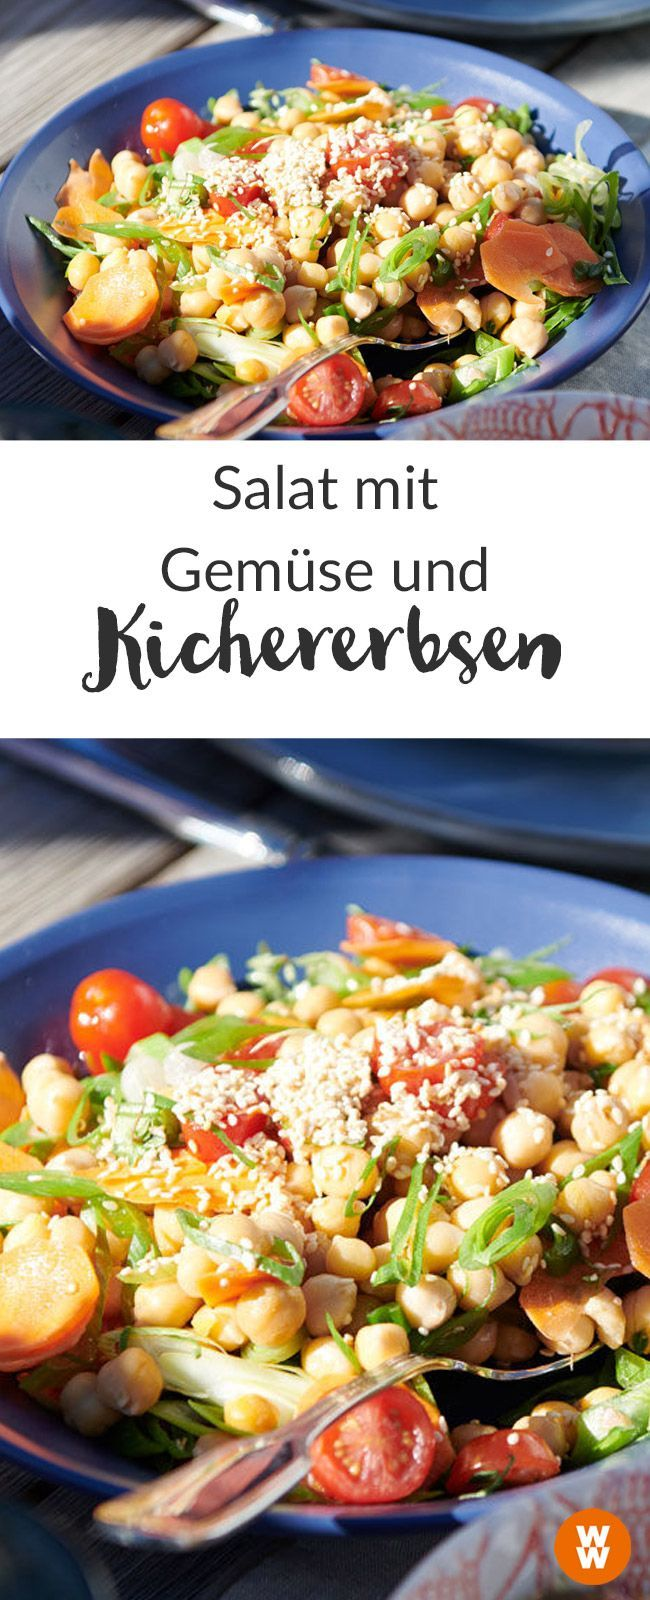 Kichererbsen-Gemüse-Salat Rezept | WW Deutschland